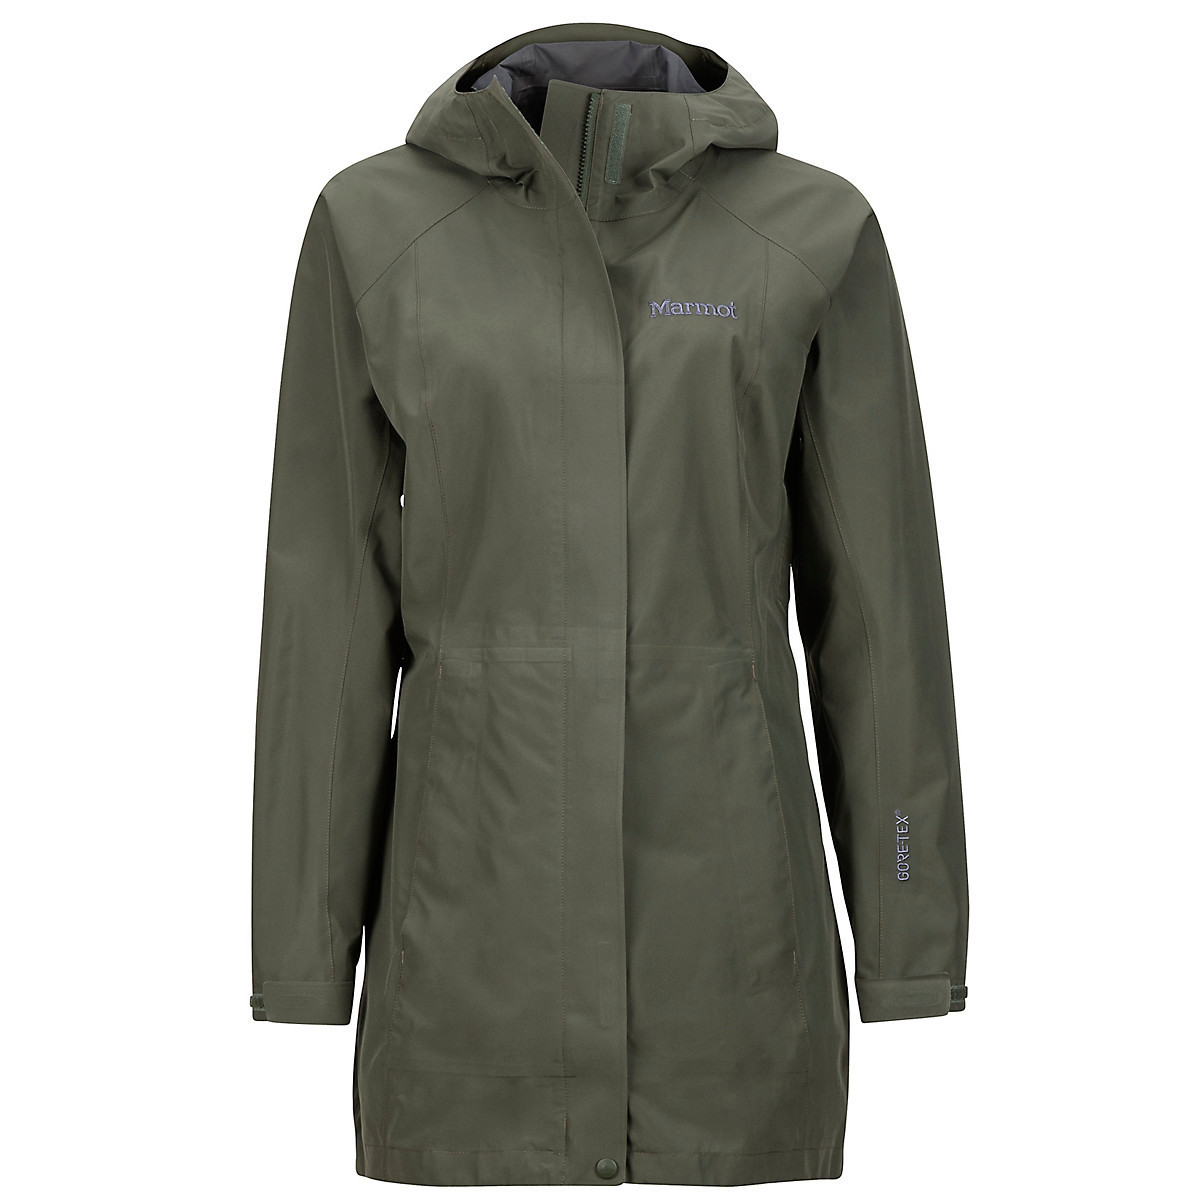 Marmot Women's Essential Jacket - Green, S